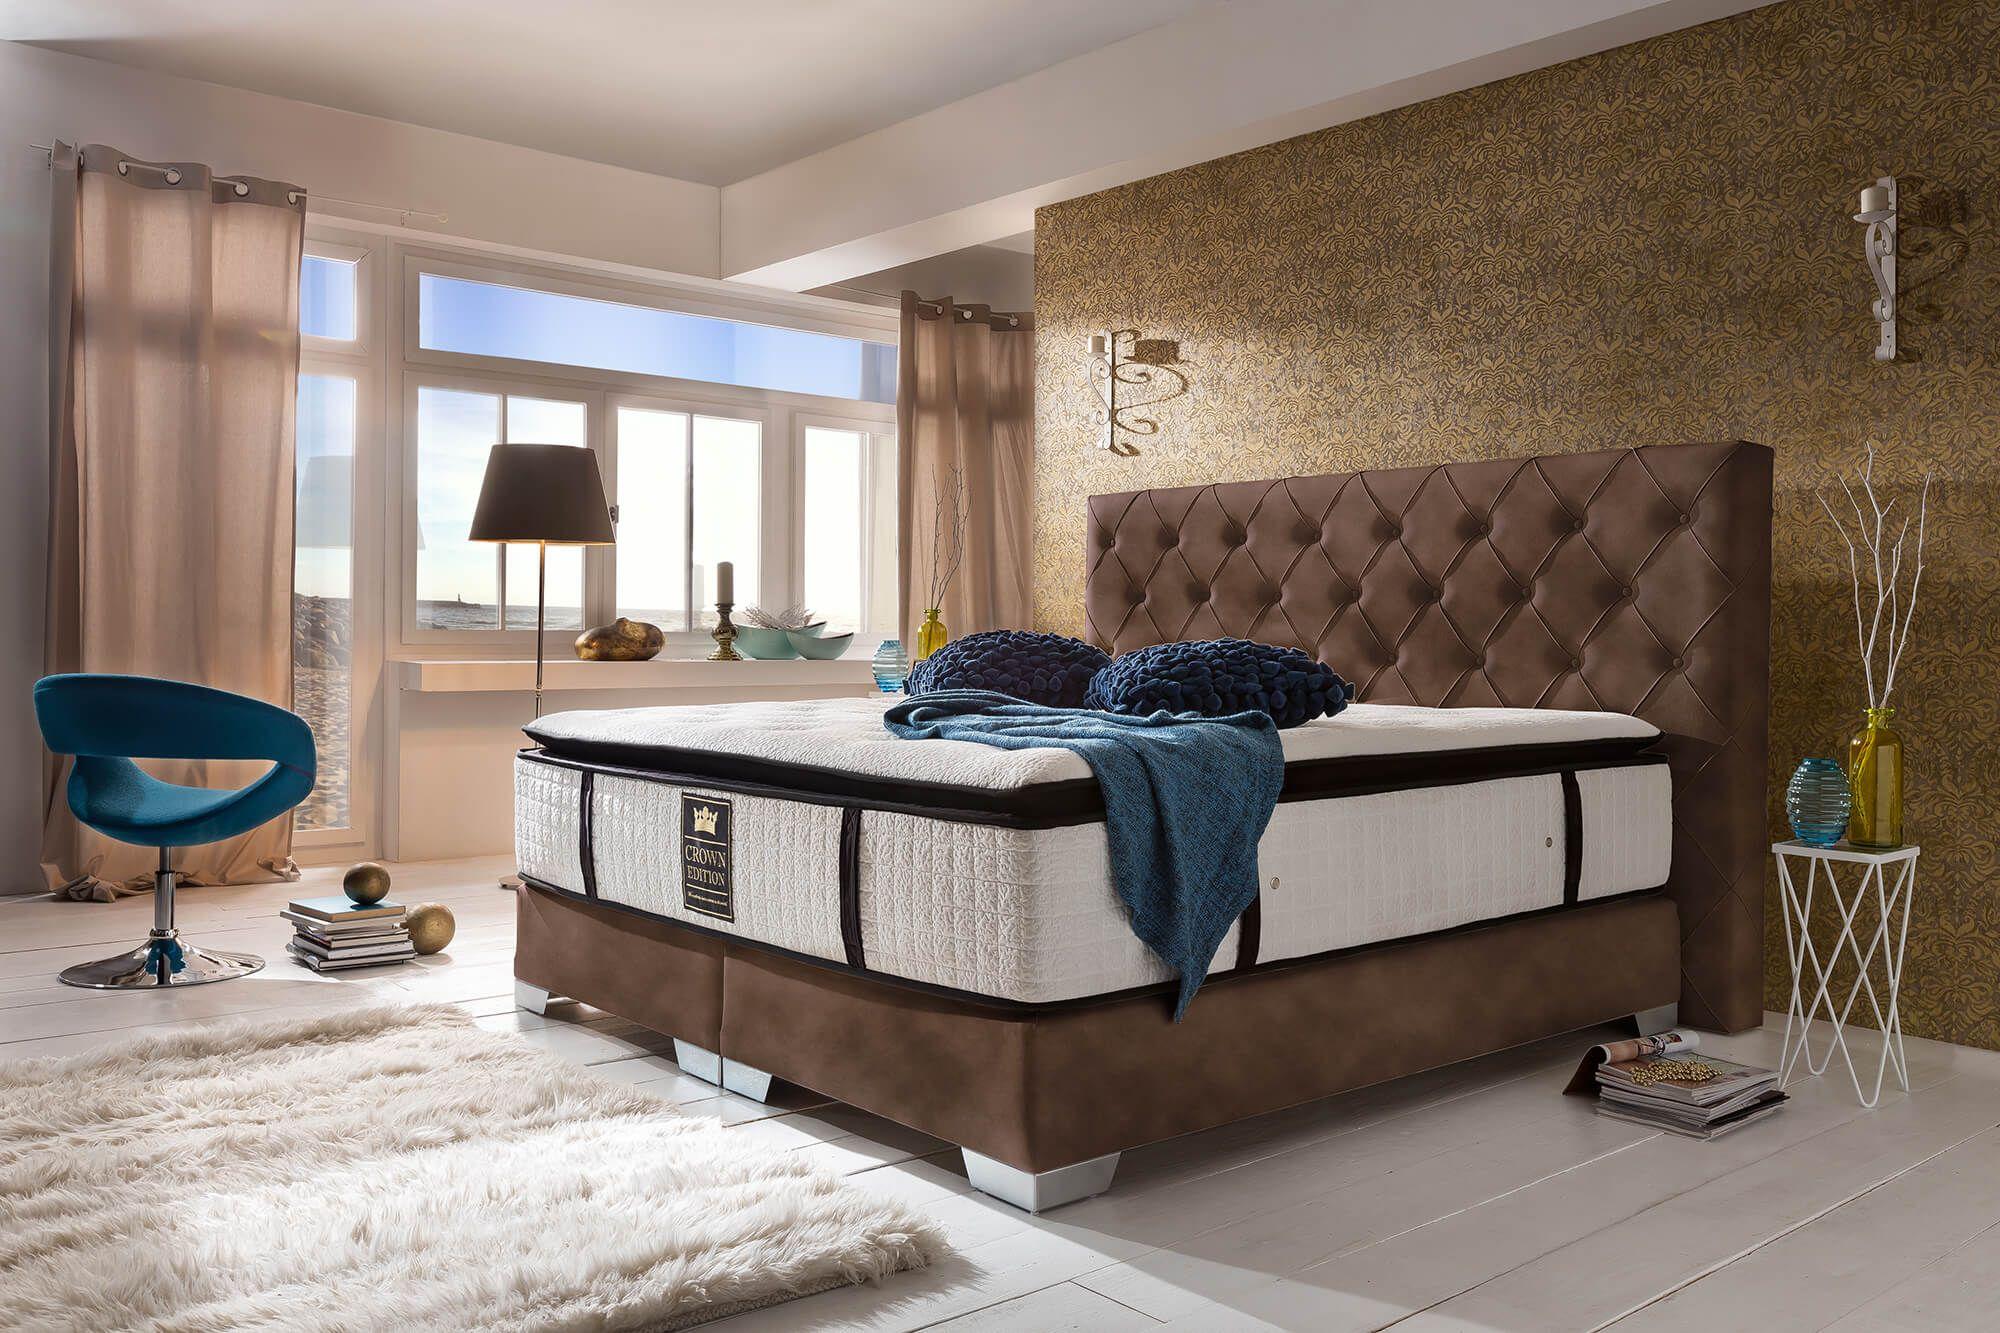 Boxspringbett Carmen Deluxe Braun Moderne Schlafzimmermobel